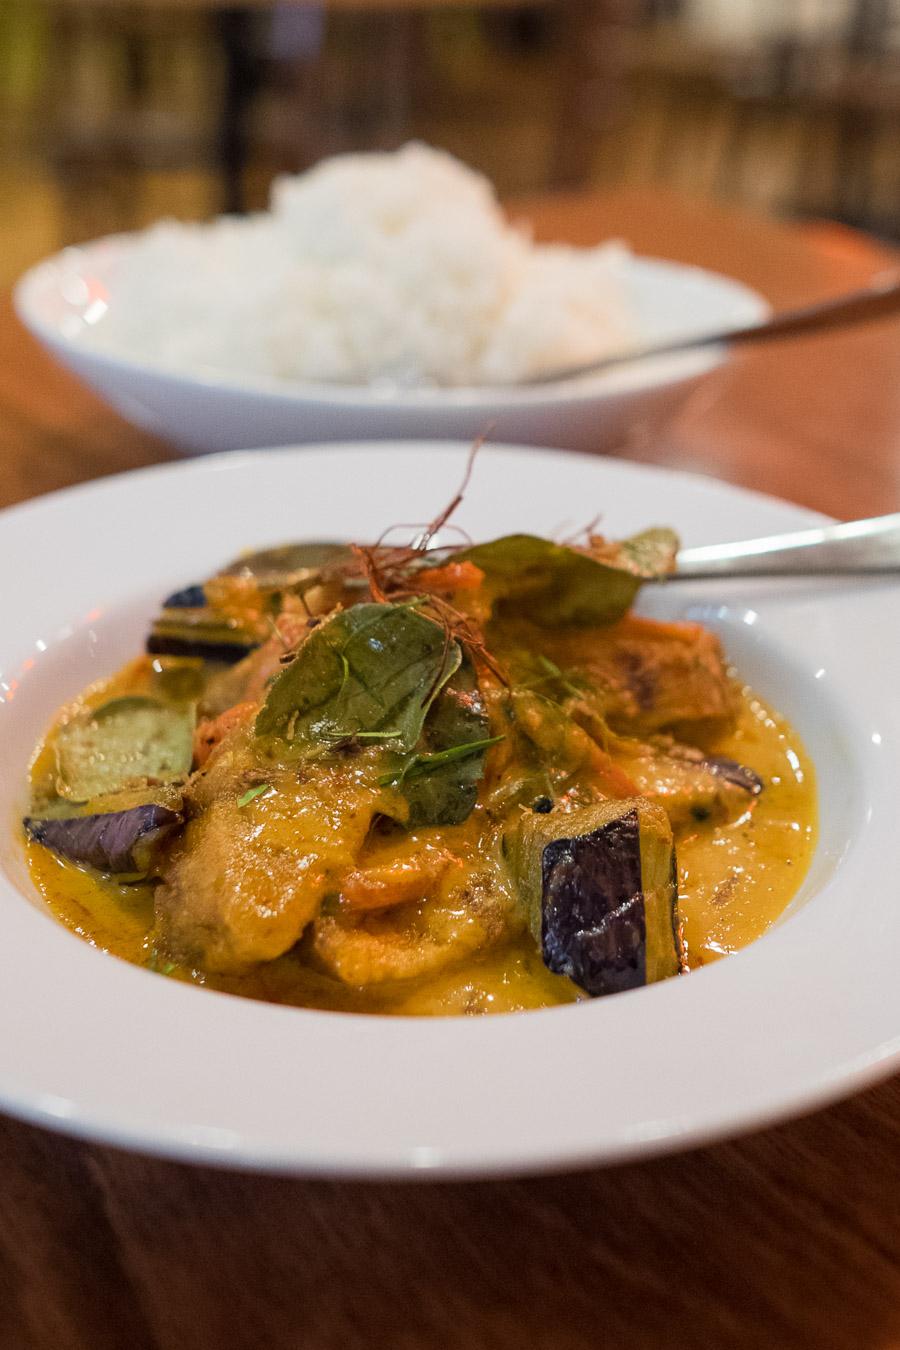 Barramundi and eggplant red curry (AU$21.50) - crispy barramundi and eggplant in dry red curry sauce with kaffir lime.